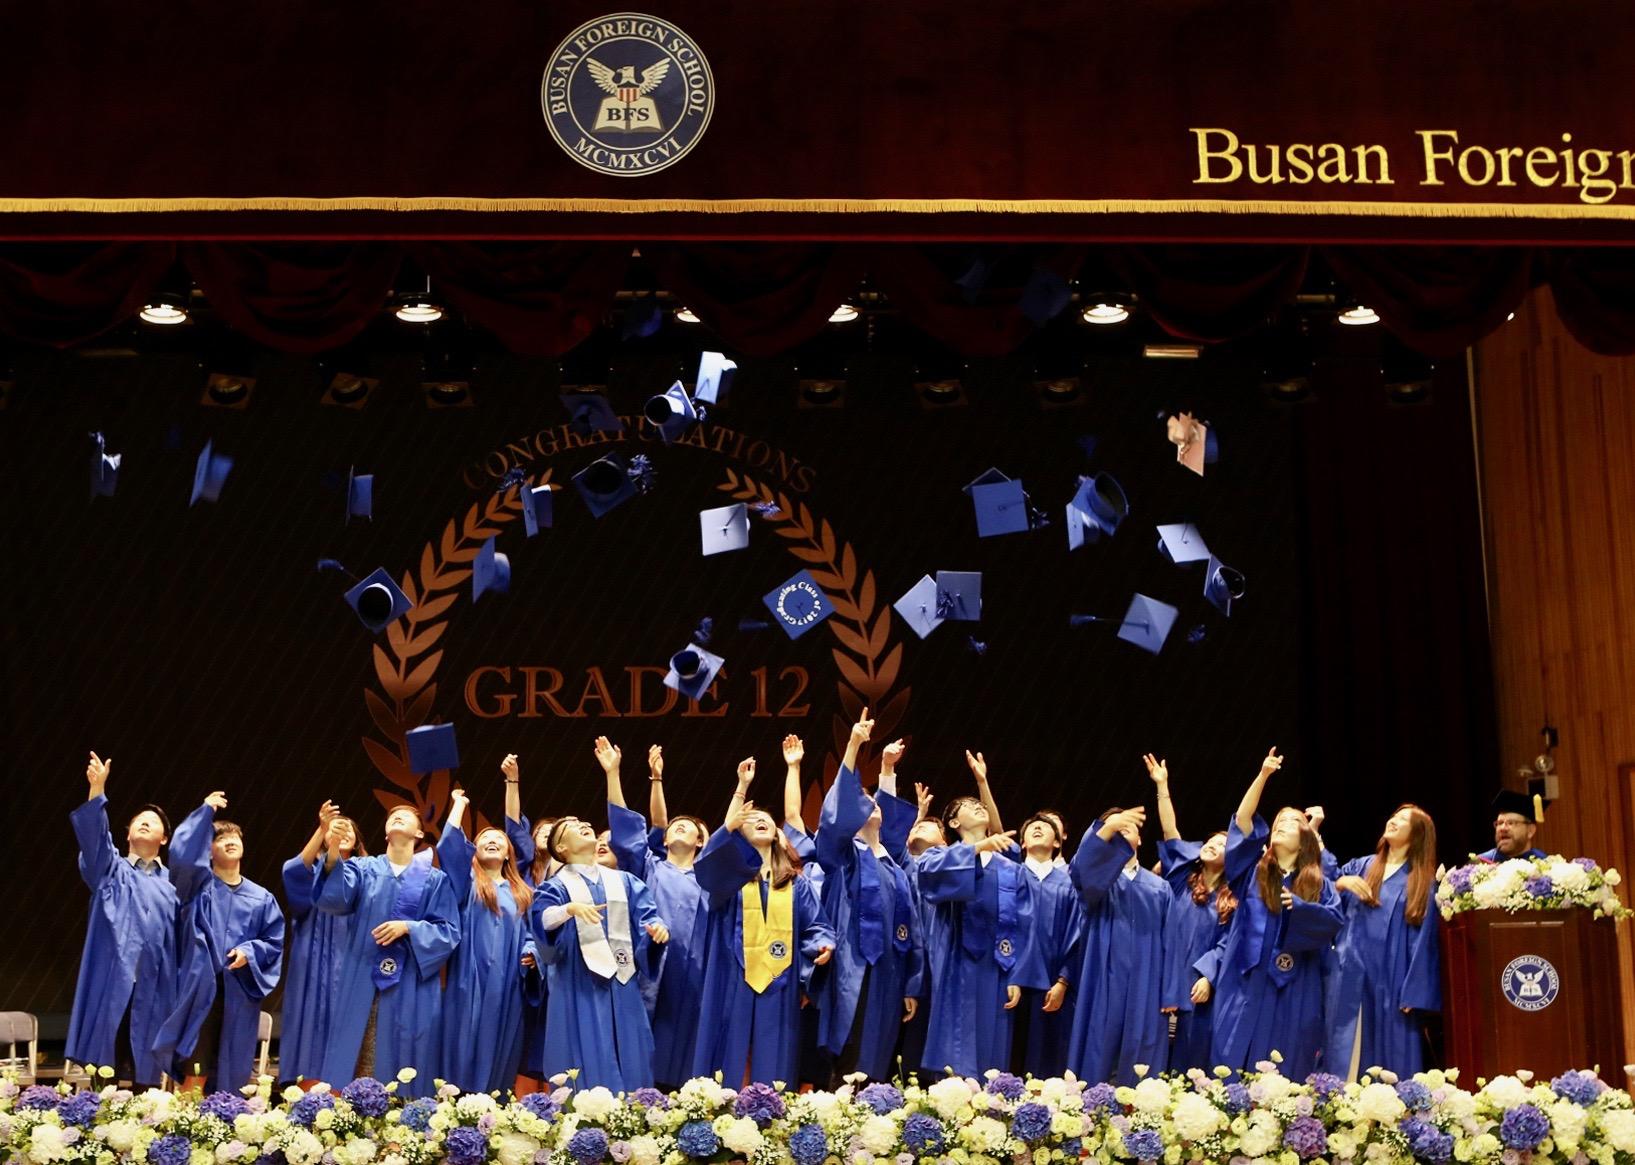 busan foreign school -